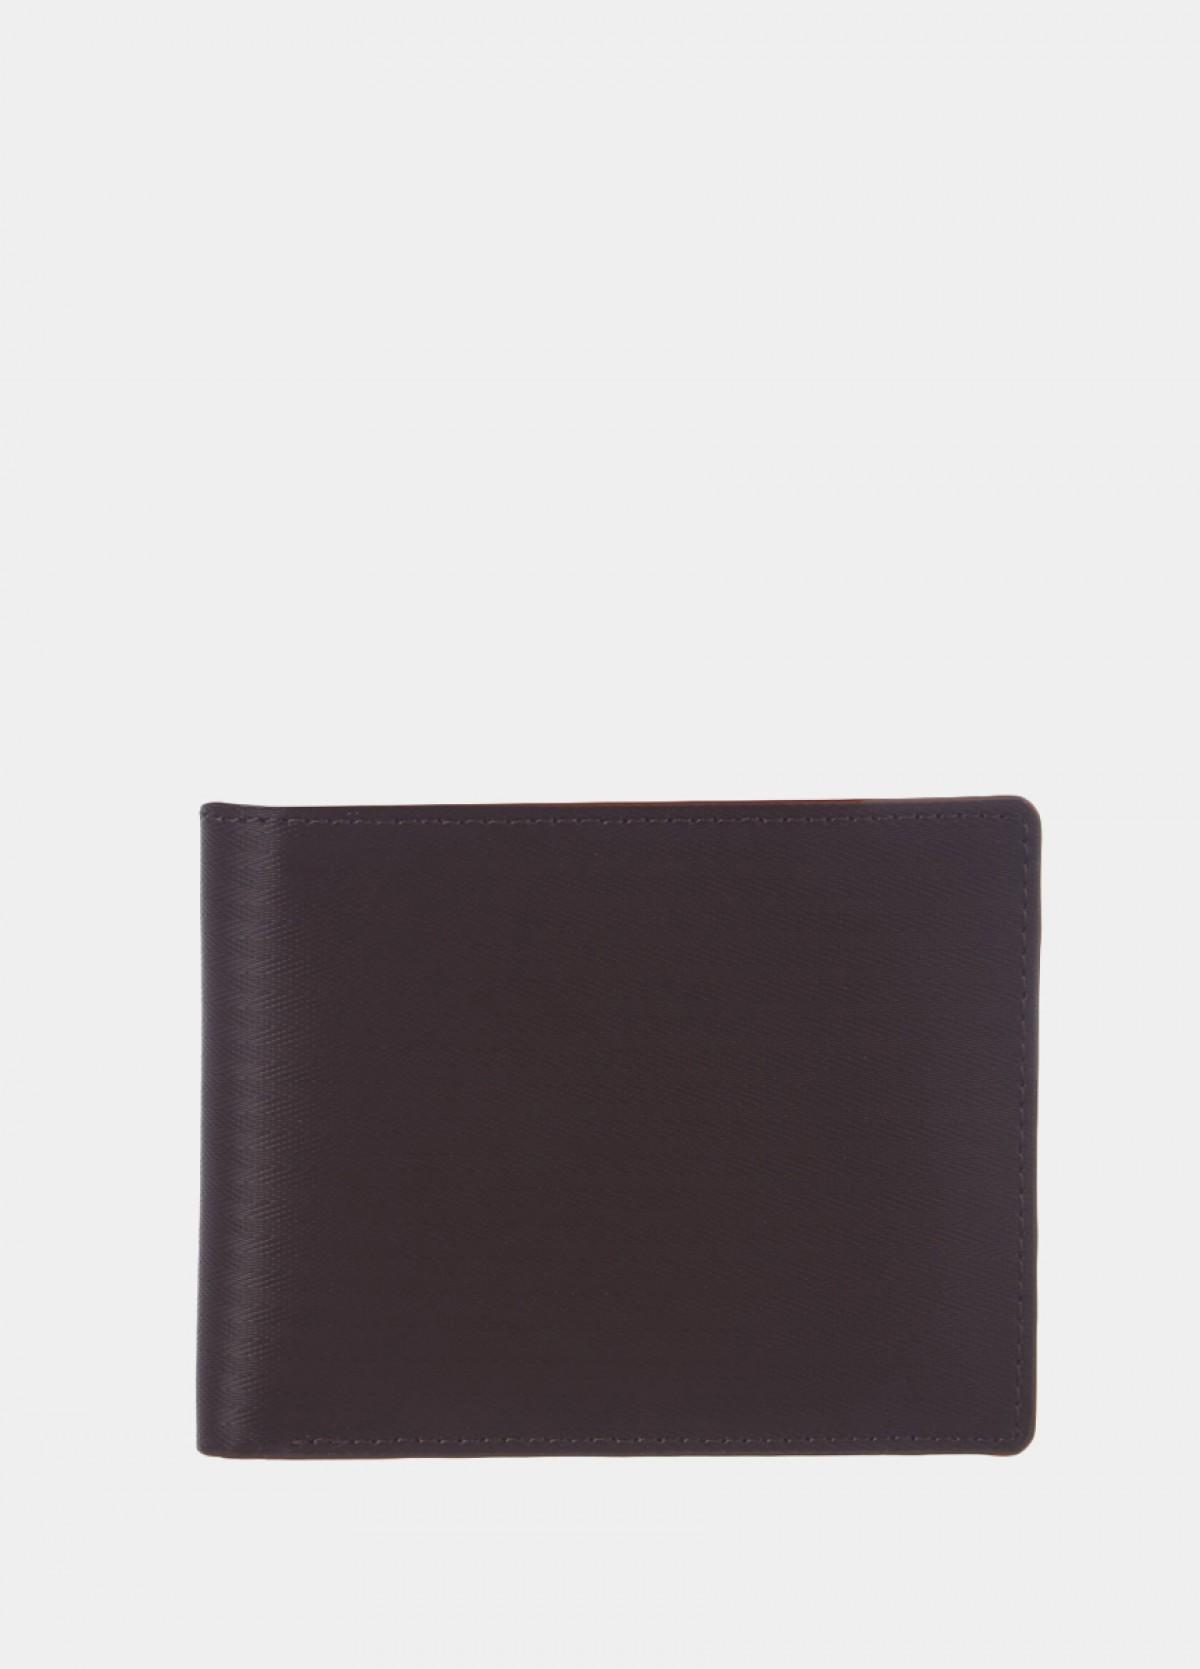 The Black Textured Bi-Fold Wallet